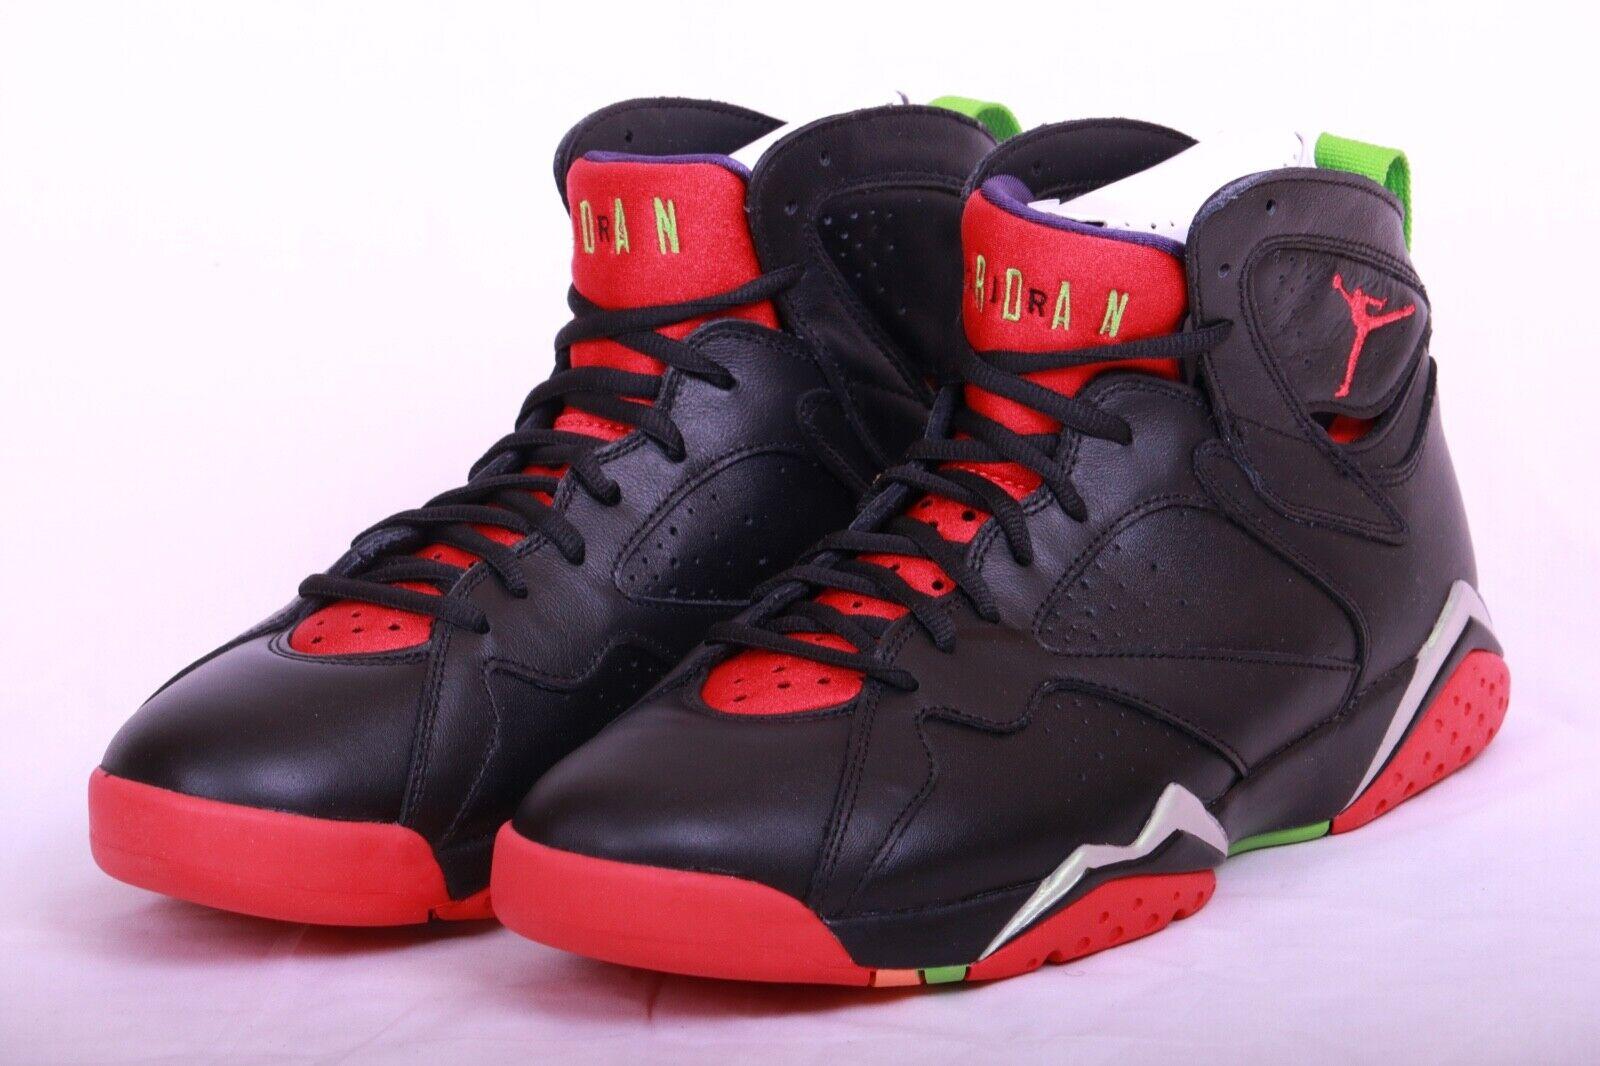 Nike Mens Air Jordan 7 VII Retro Marvin the Martian Black Red 304775 029 Size 11